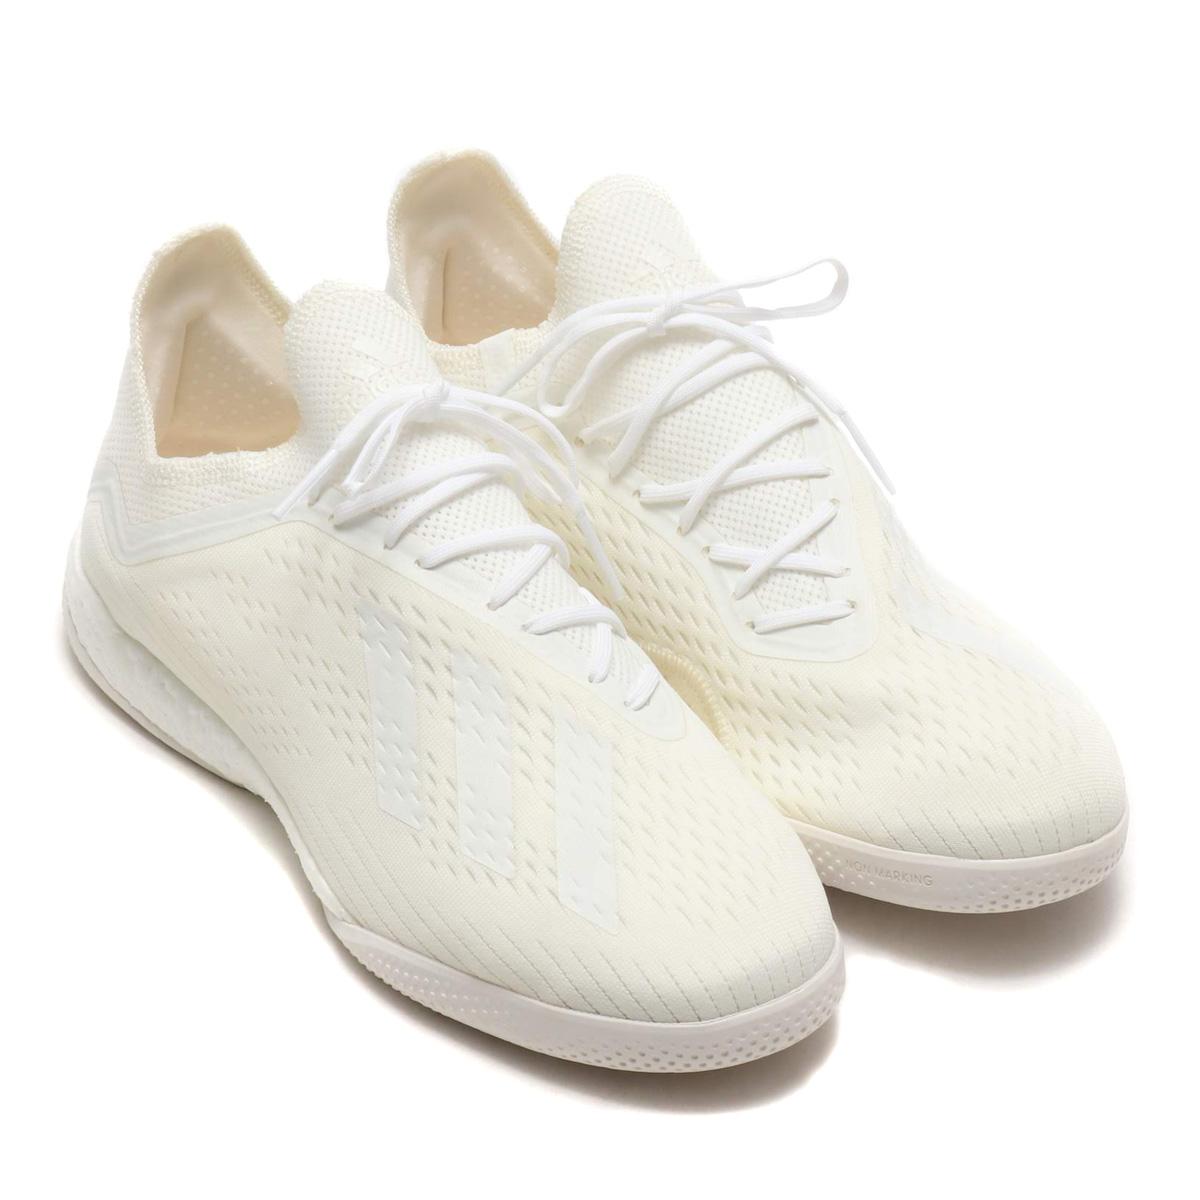 a46056bc3 adidas X TANGO 18.1 TR (Adidas X tango 18.1 TR) OFF WHITE/RUNNING ...